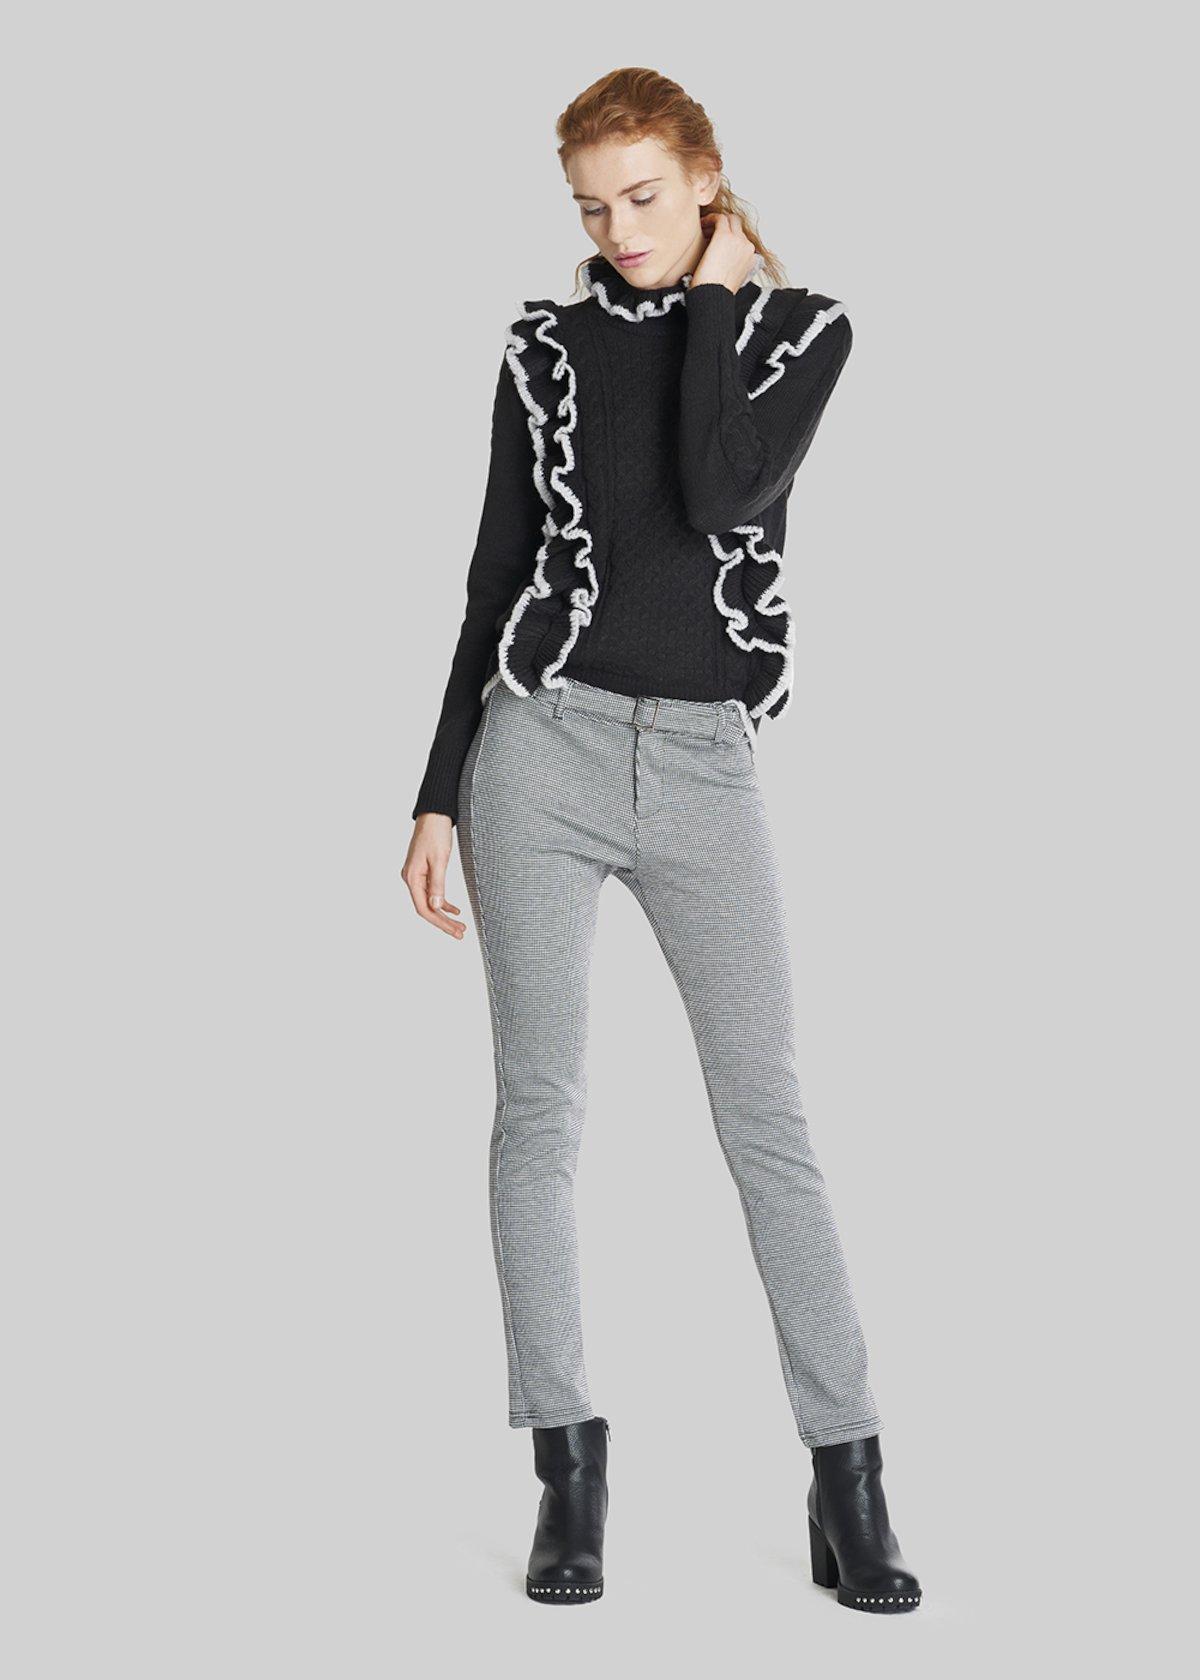 Paliky trousers with waist belt - Black White Fantasia - Woman - Category image